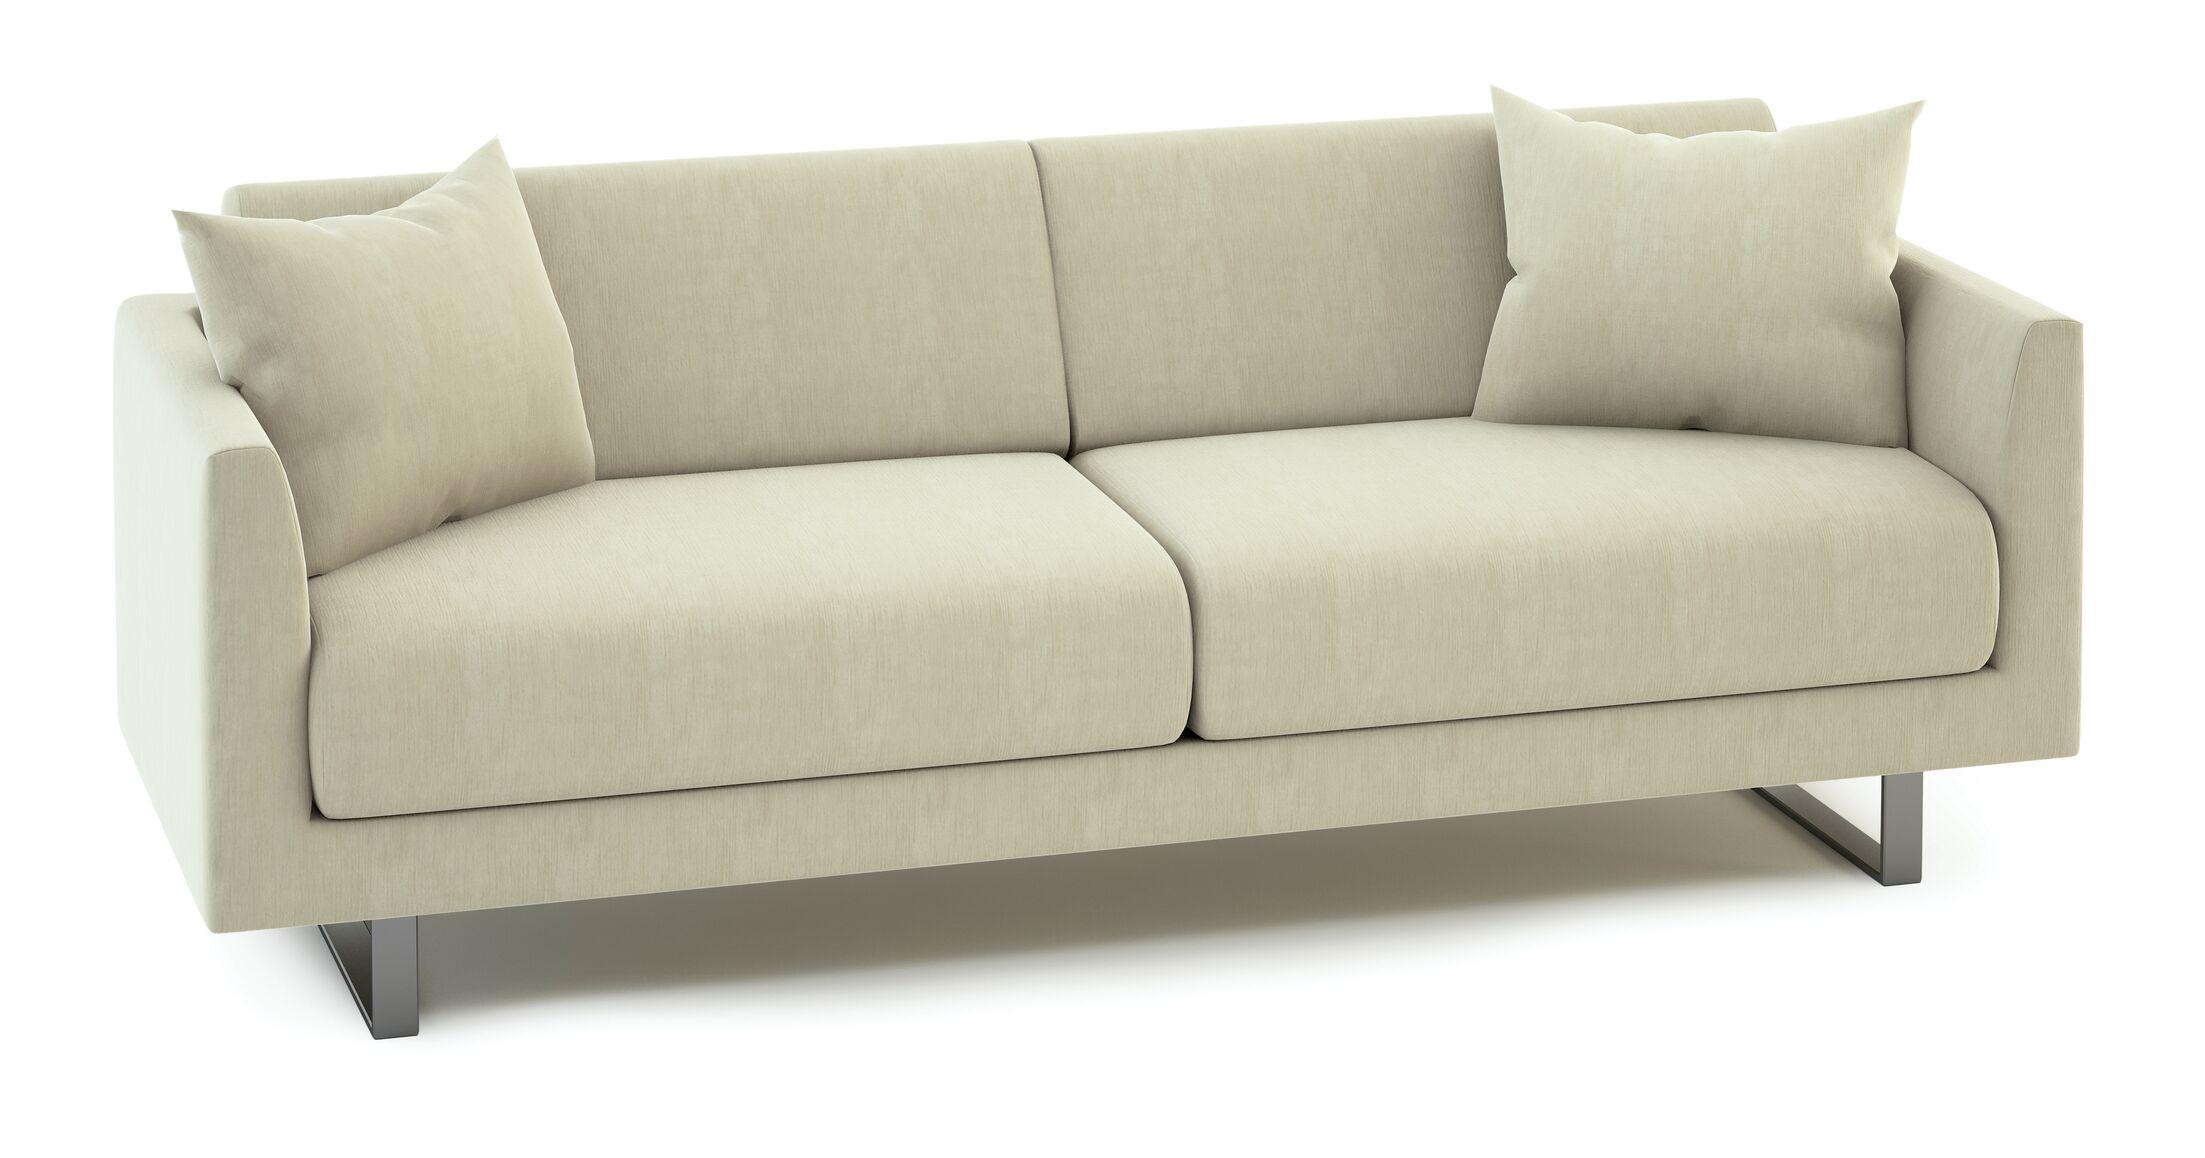 Fizz Mellini Patio Sofa Fabric Color: Canvas True Blue